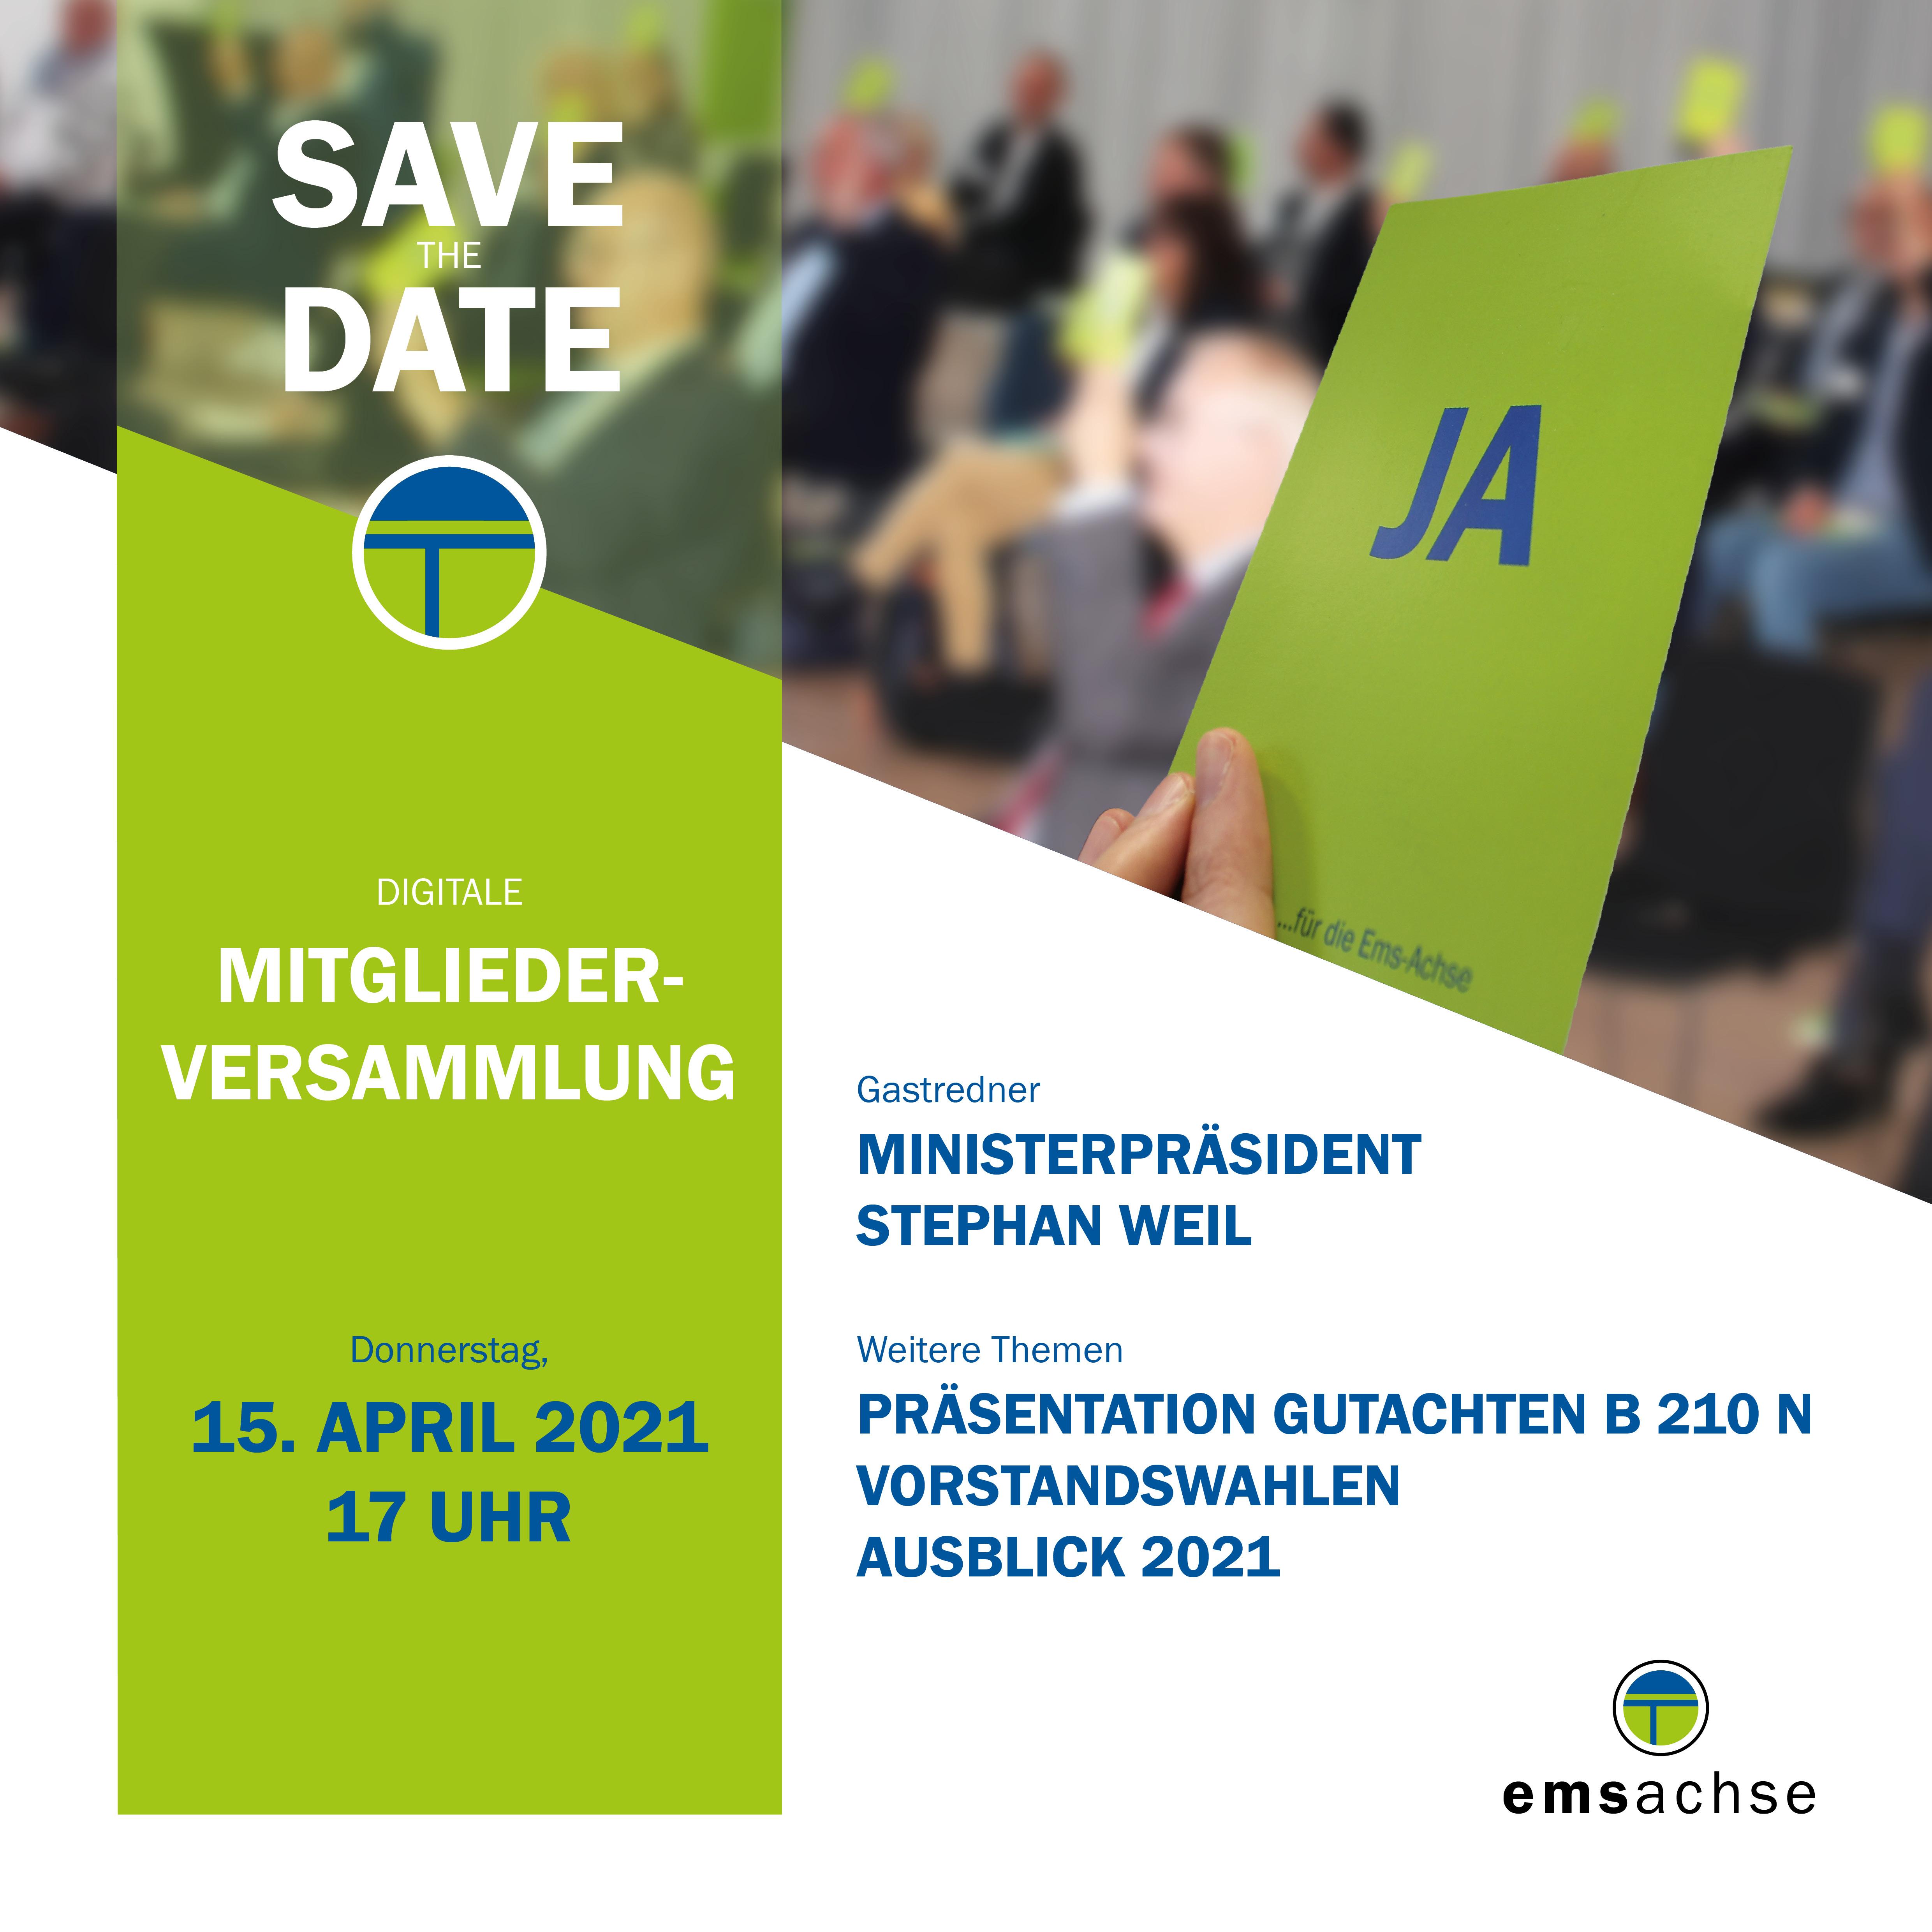 https://www.emsachse.de/storage/event/images/Fotos/2021MGV_SaveTheDate.jpg